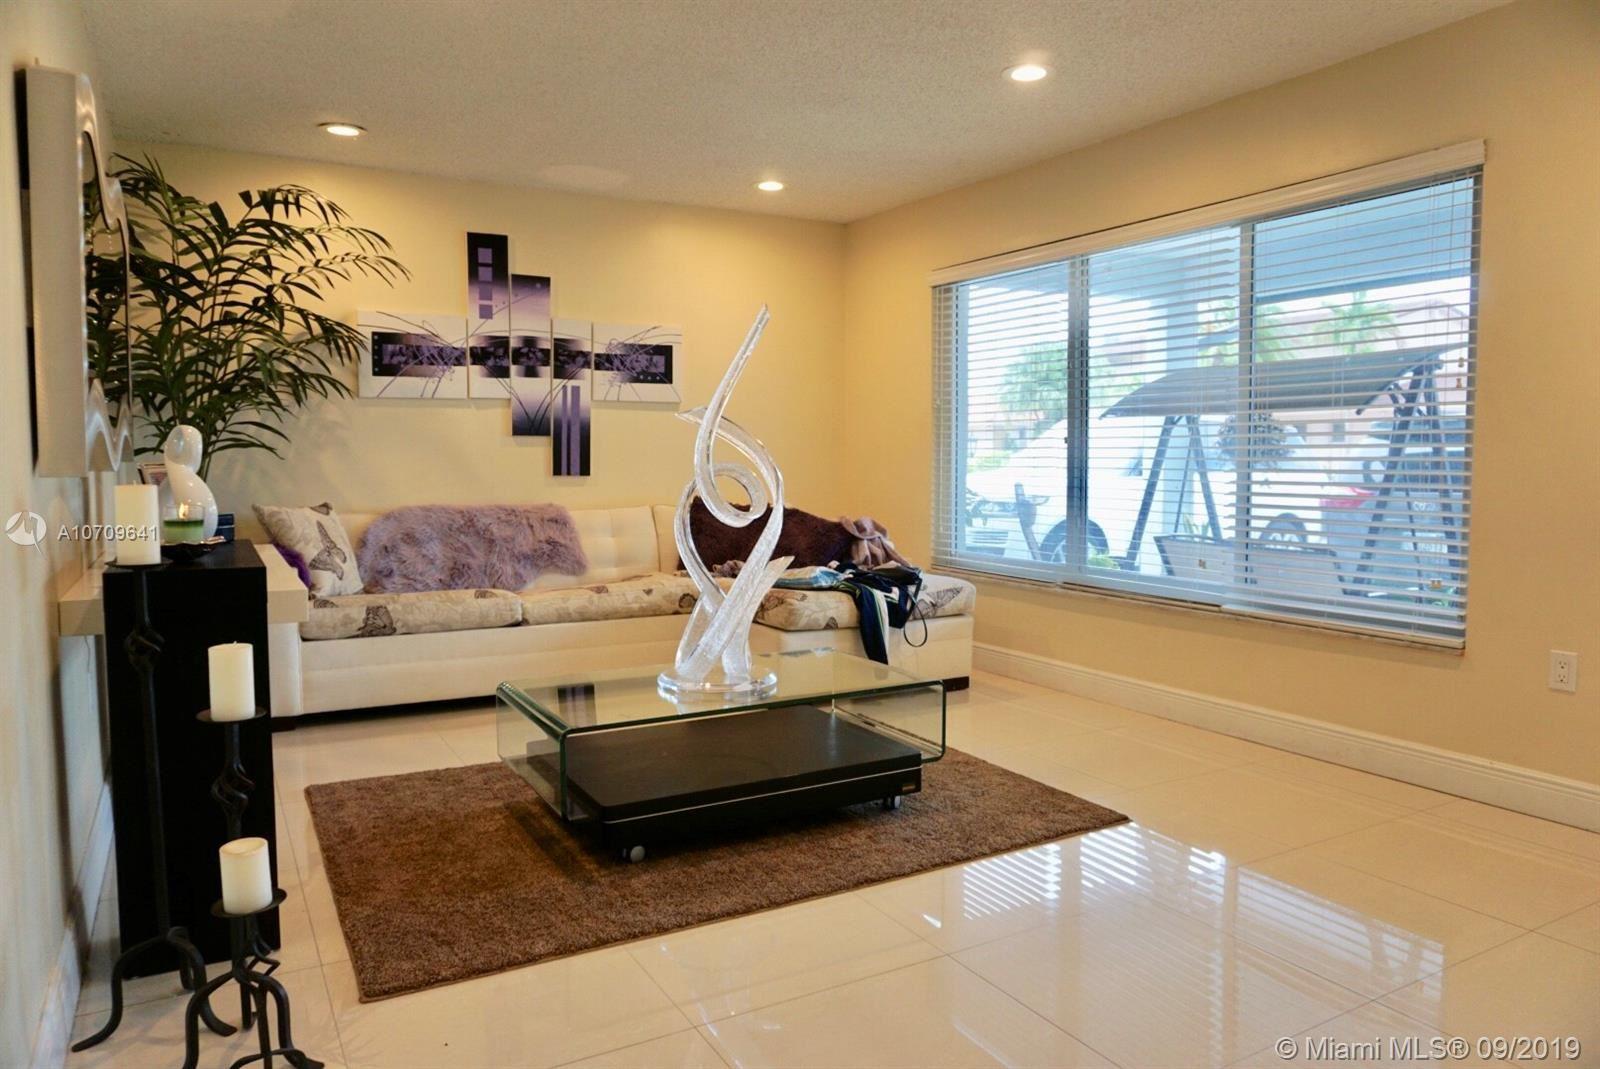 1620 SW 126 PL, Miami, FL 33175 - #: A10709641